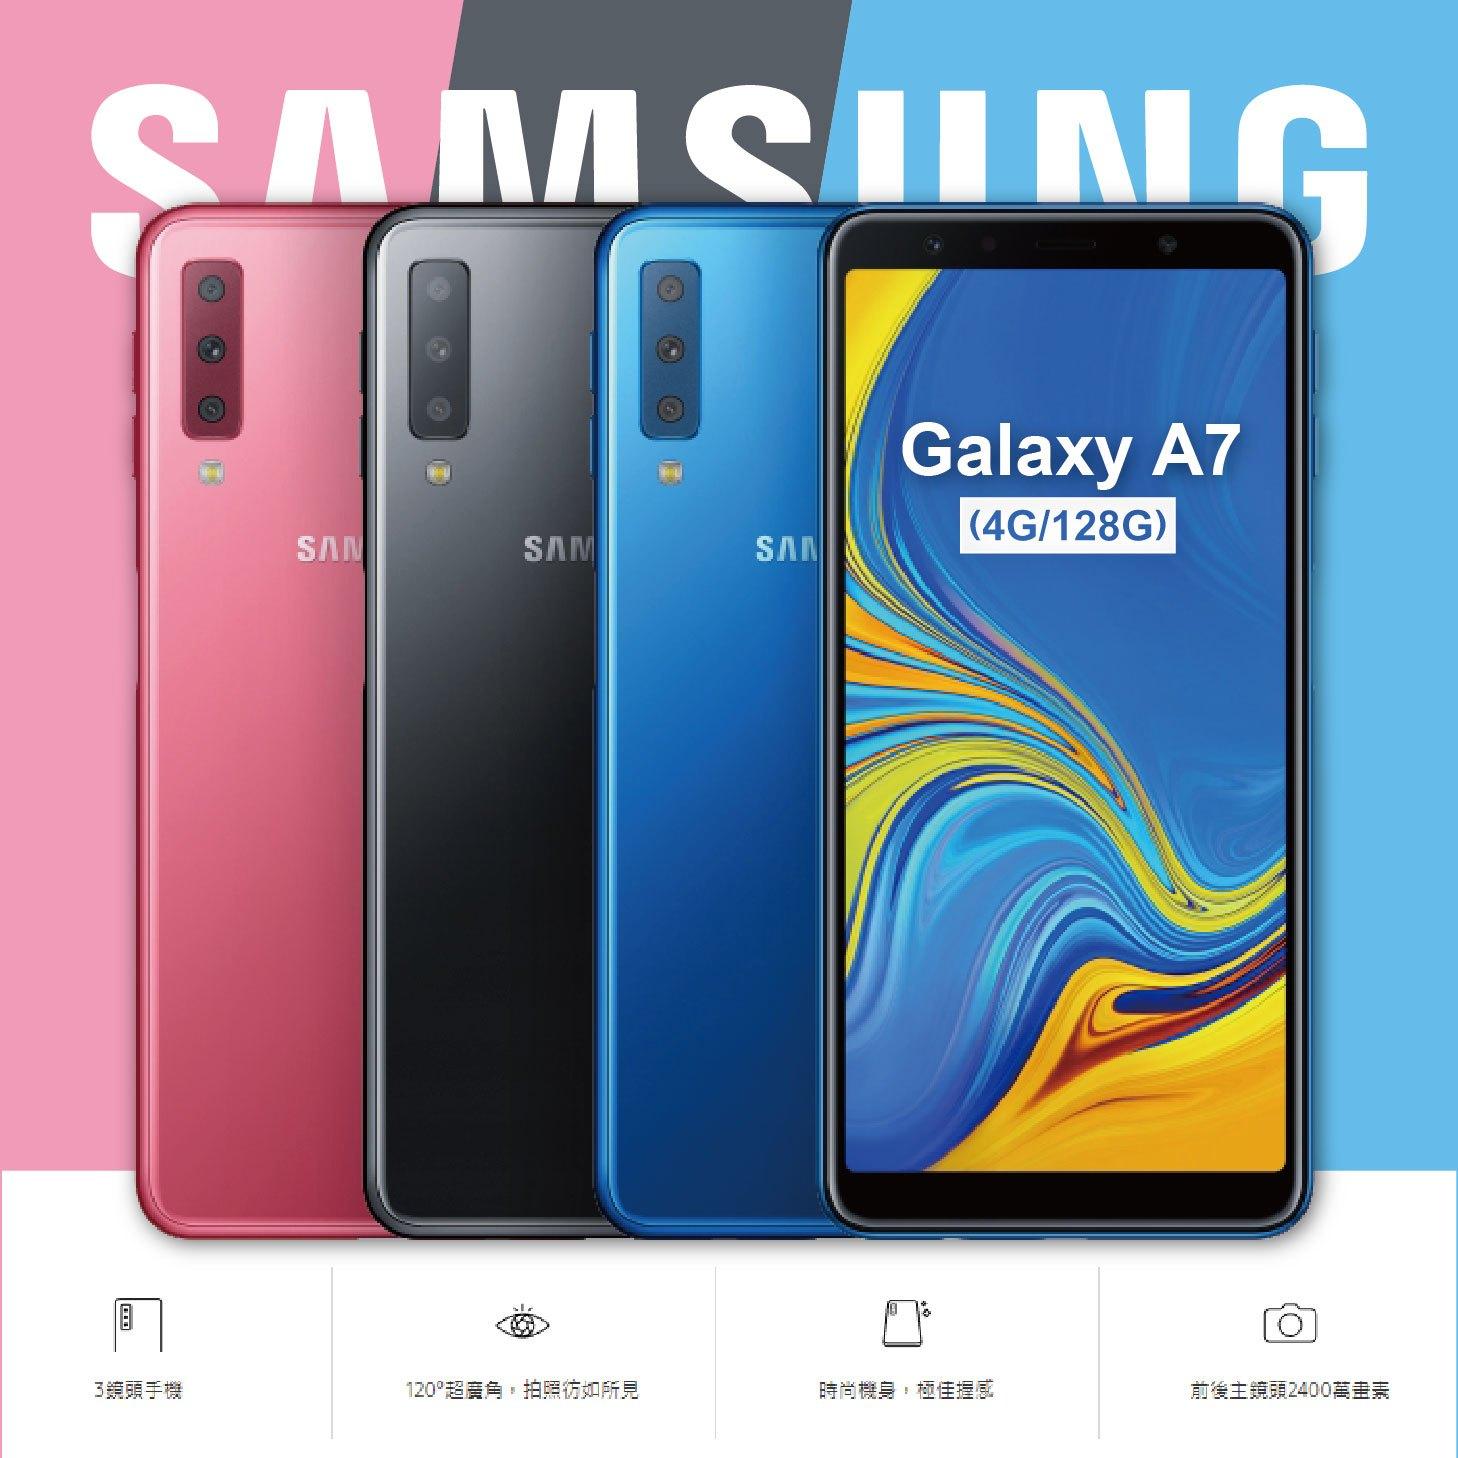 Galaxy A7(2018) 三星首款三鏡頭手機 120°超廣角 ※買空機送 玻璃保護貼+空壓殼 手機顏色下單前請先詢問